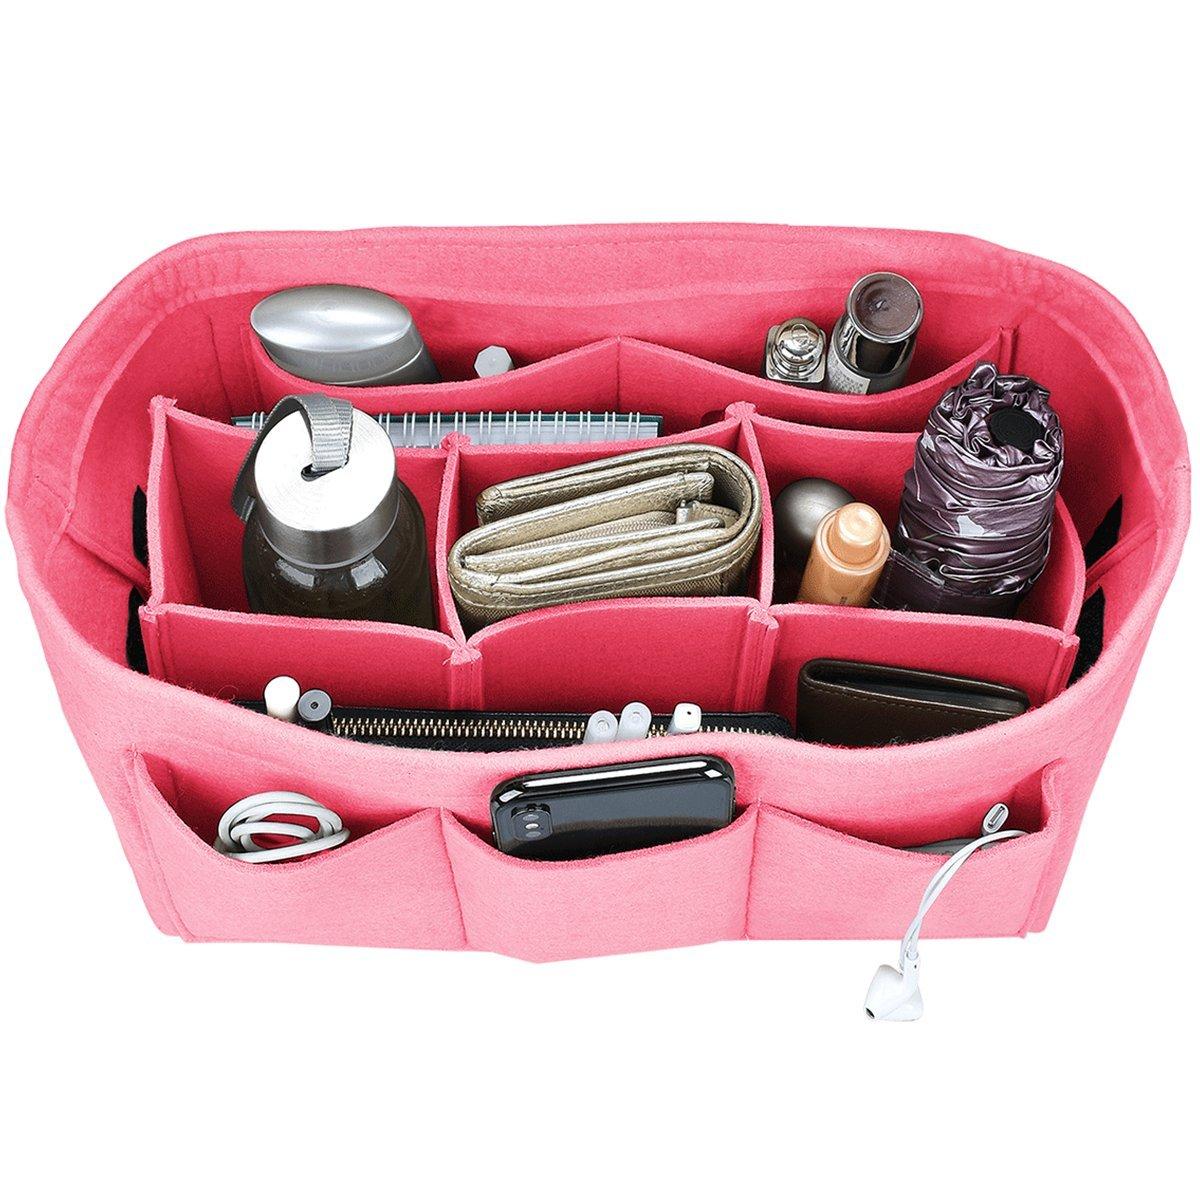 Felt Purse Insert Organizer, Handbag organizer, Bag in Bag for Handbag Purse Tote, Diaper Bag Organizer, Stand on Its Own, 12 Compartments, 3 Sizes (Medium, Pink)